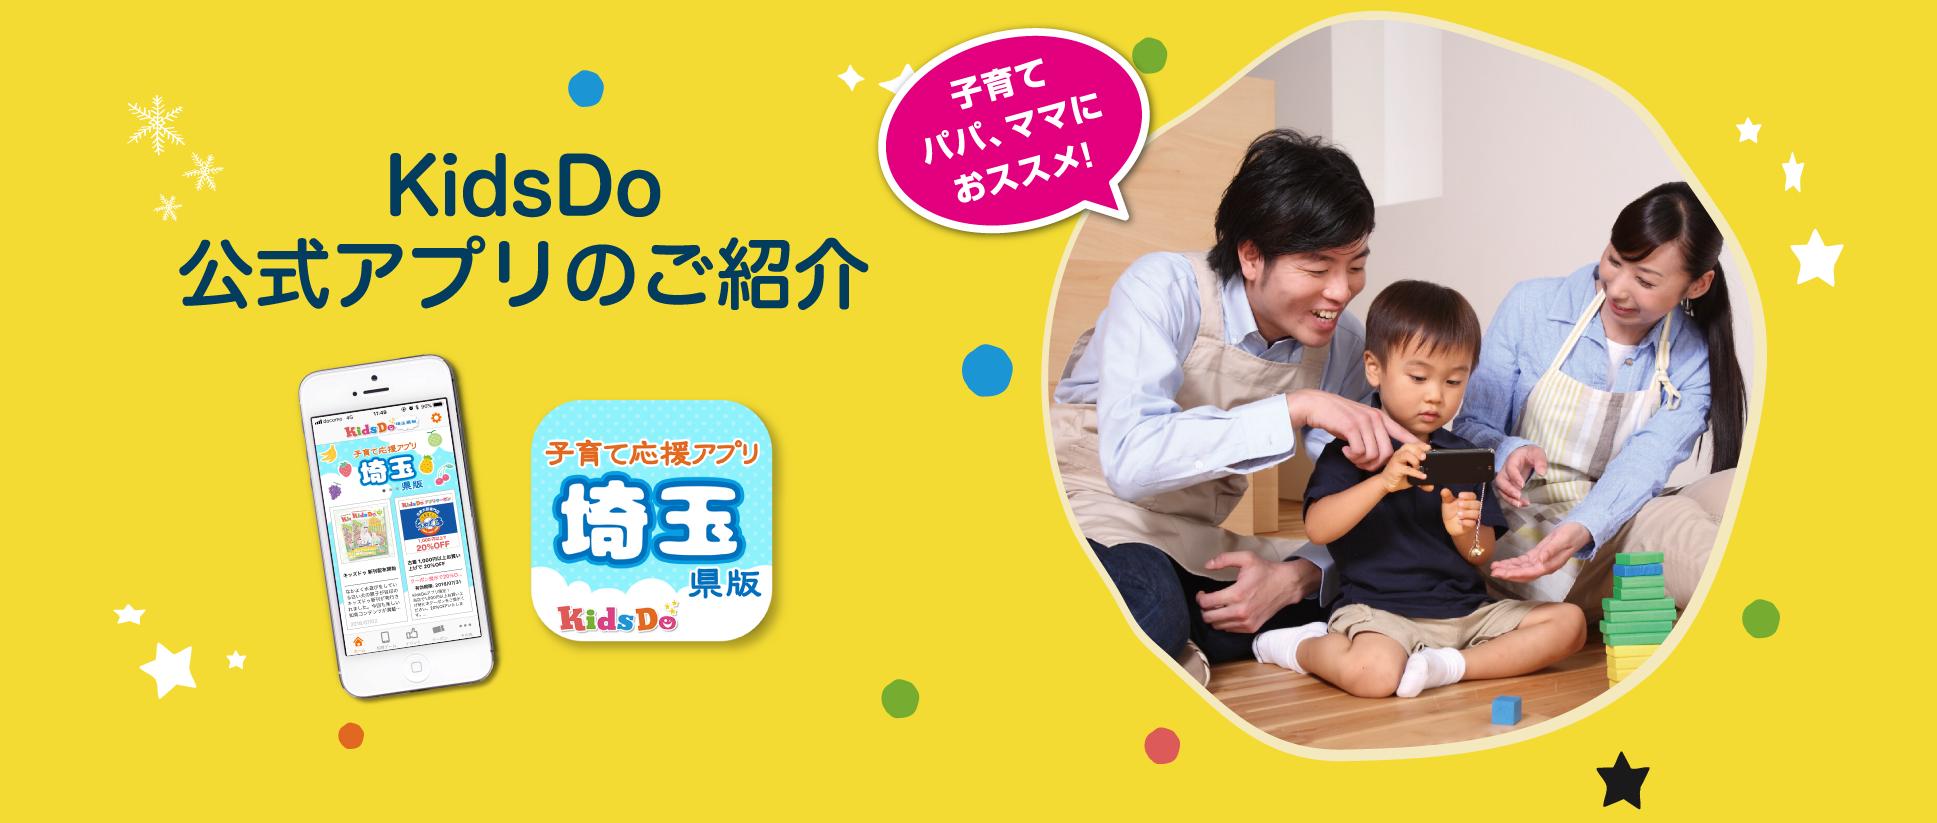 KidsDo(キッズドゥ)埼玉県版 公式アプリのご紹介